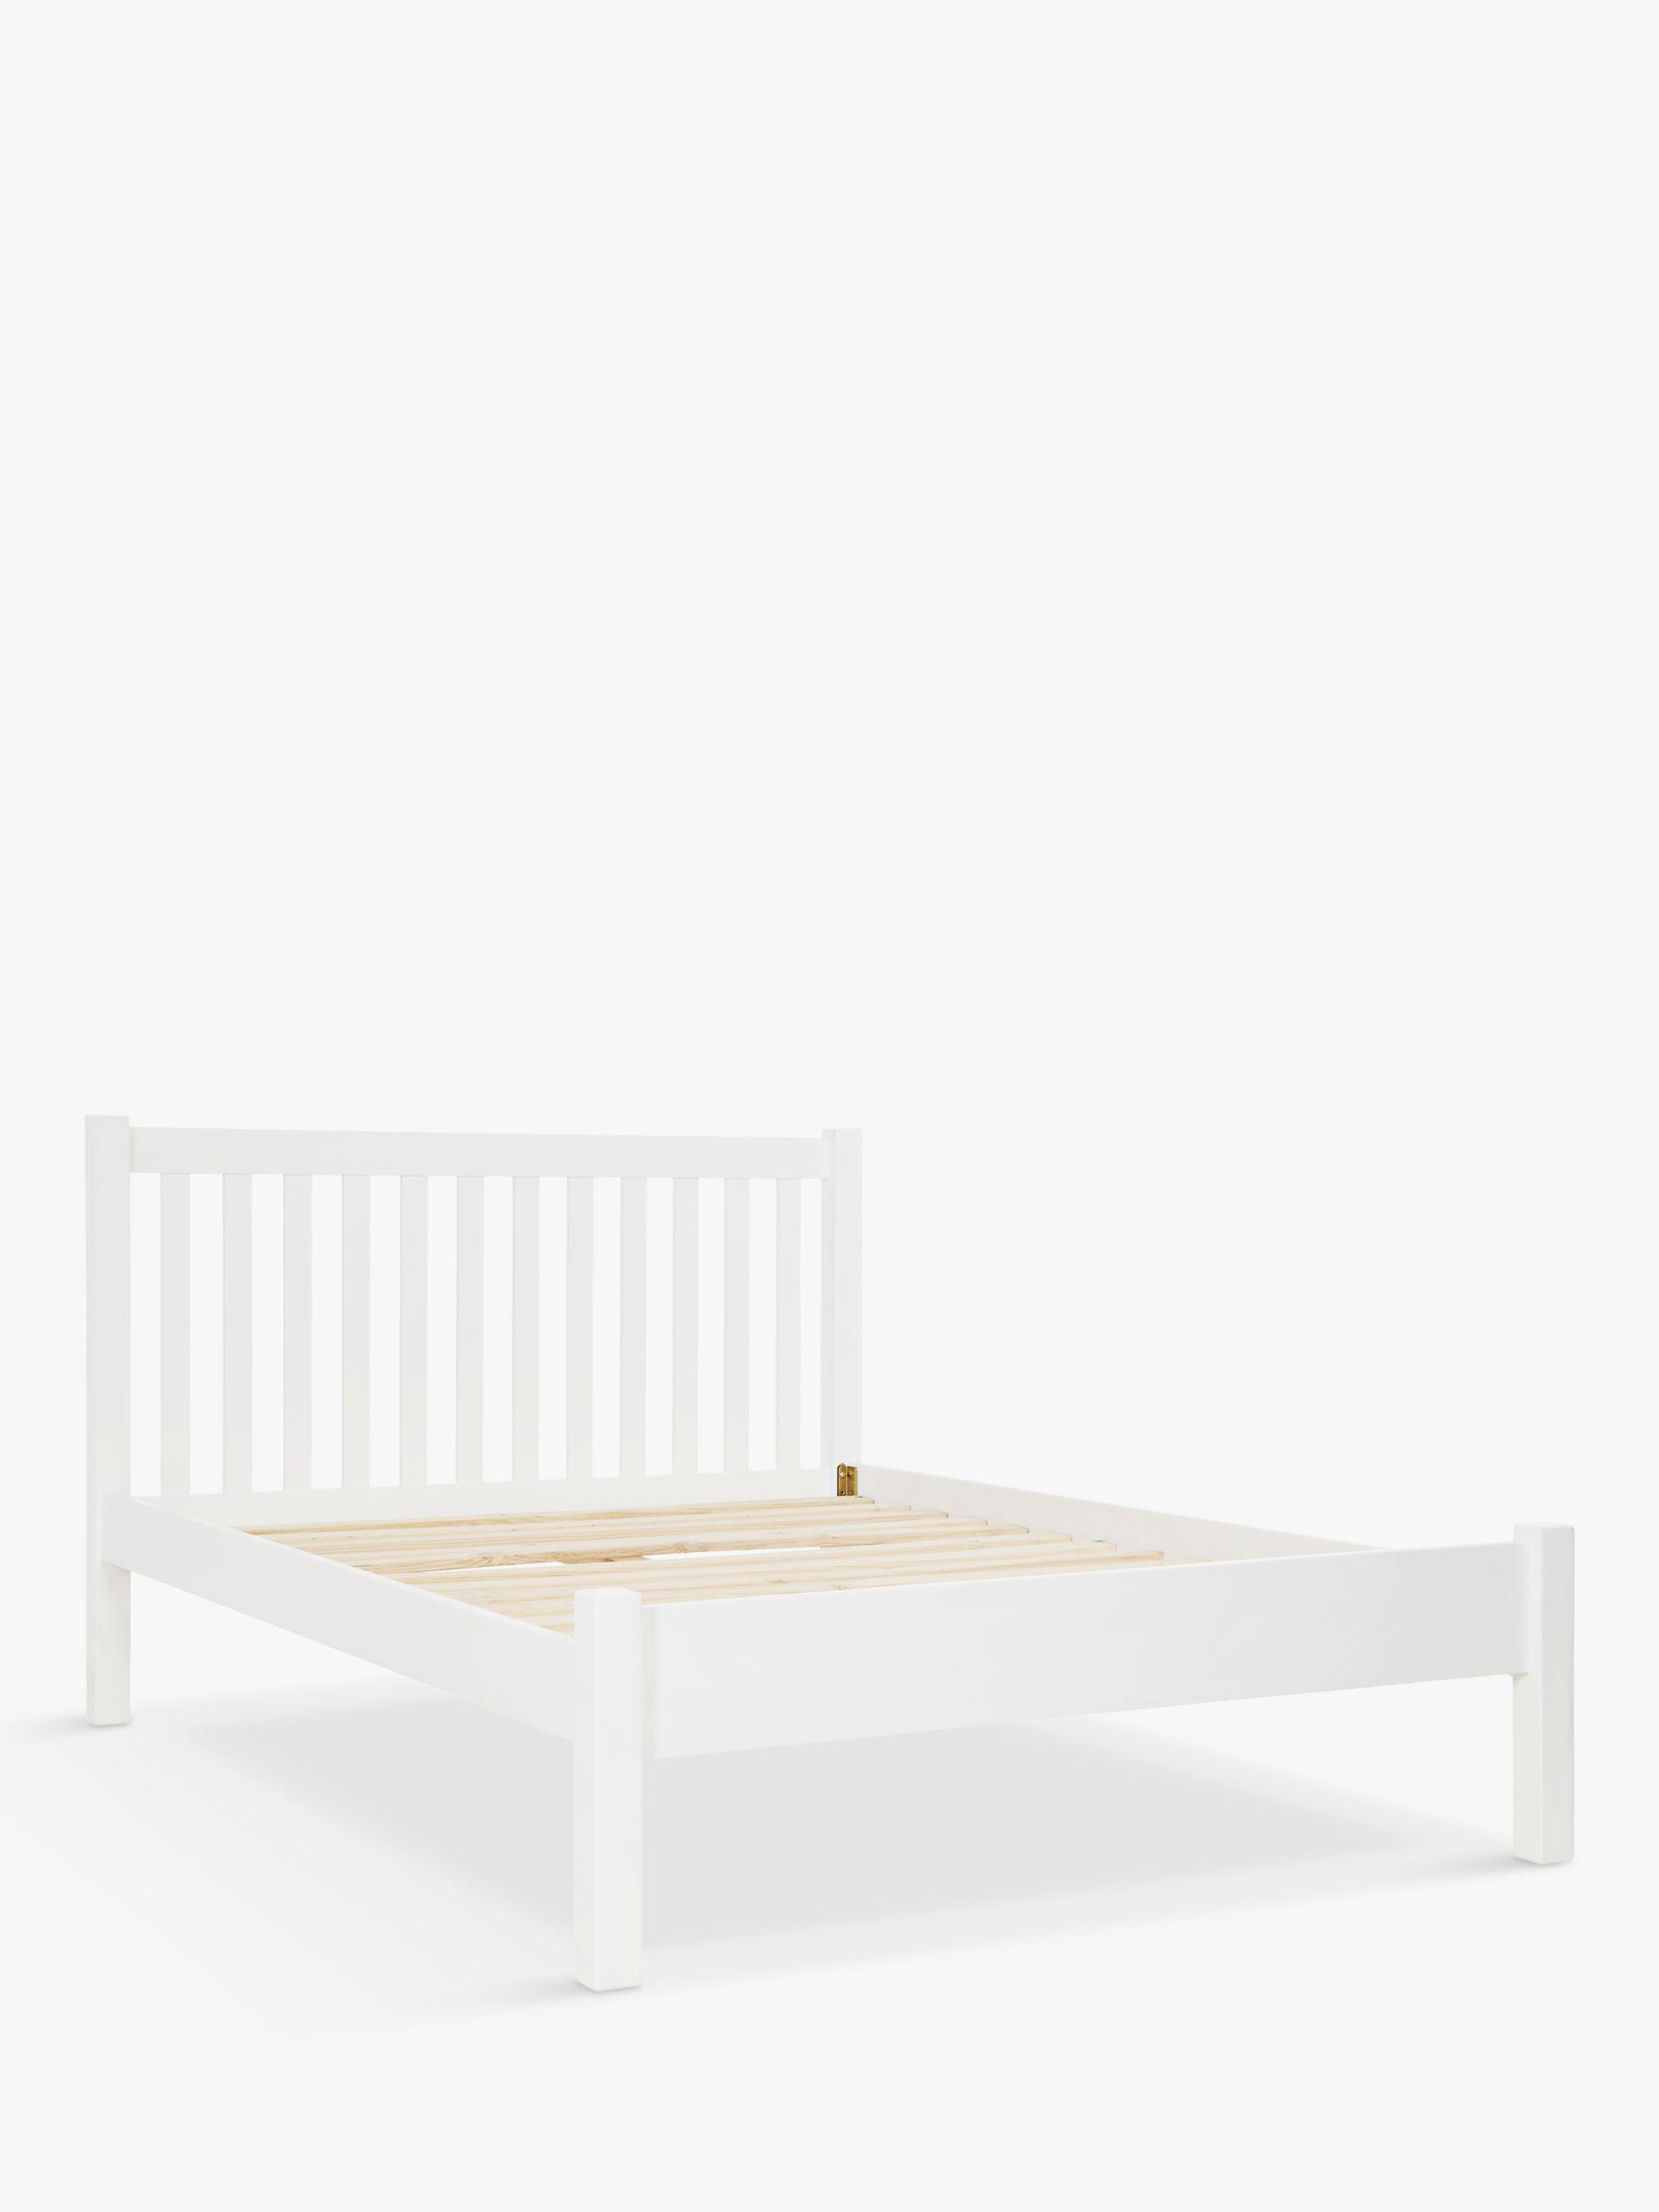 Aspley Small Double Bed Frame Instructions Viewframes Co